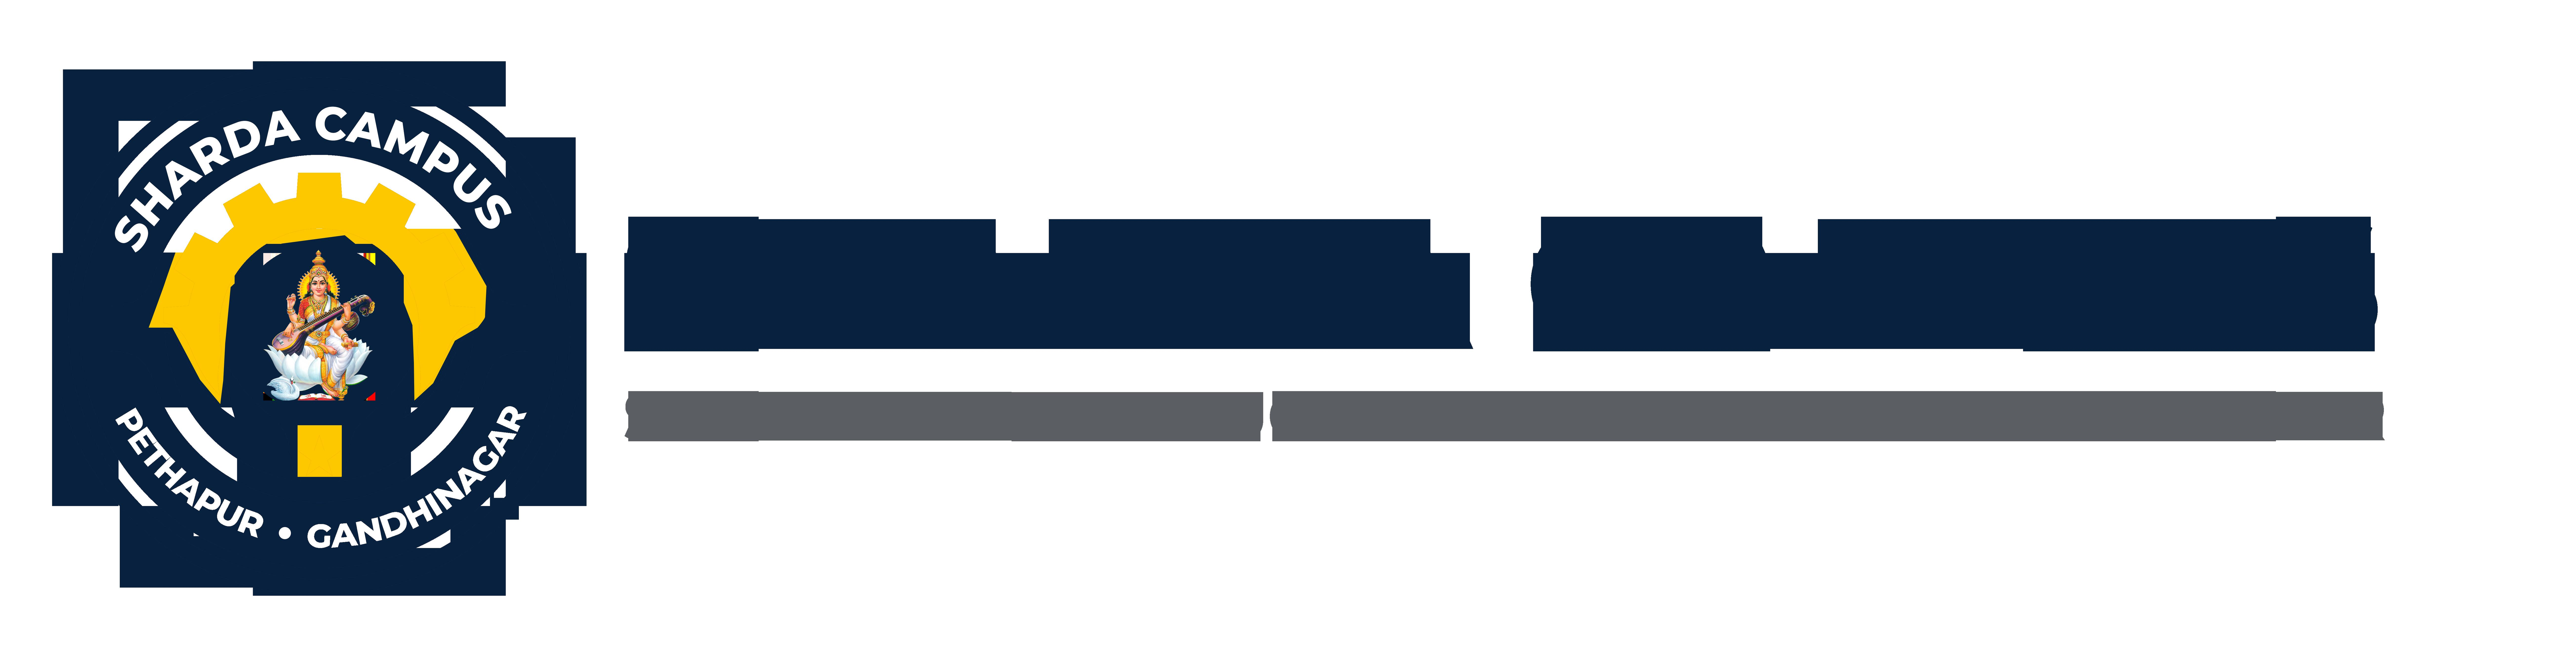 Sharda Campus